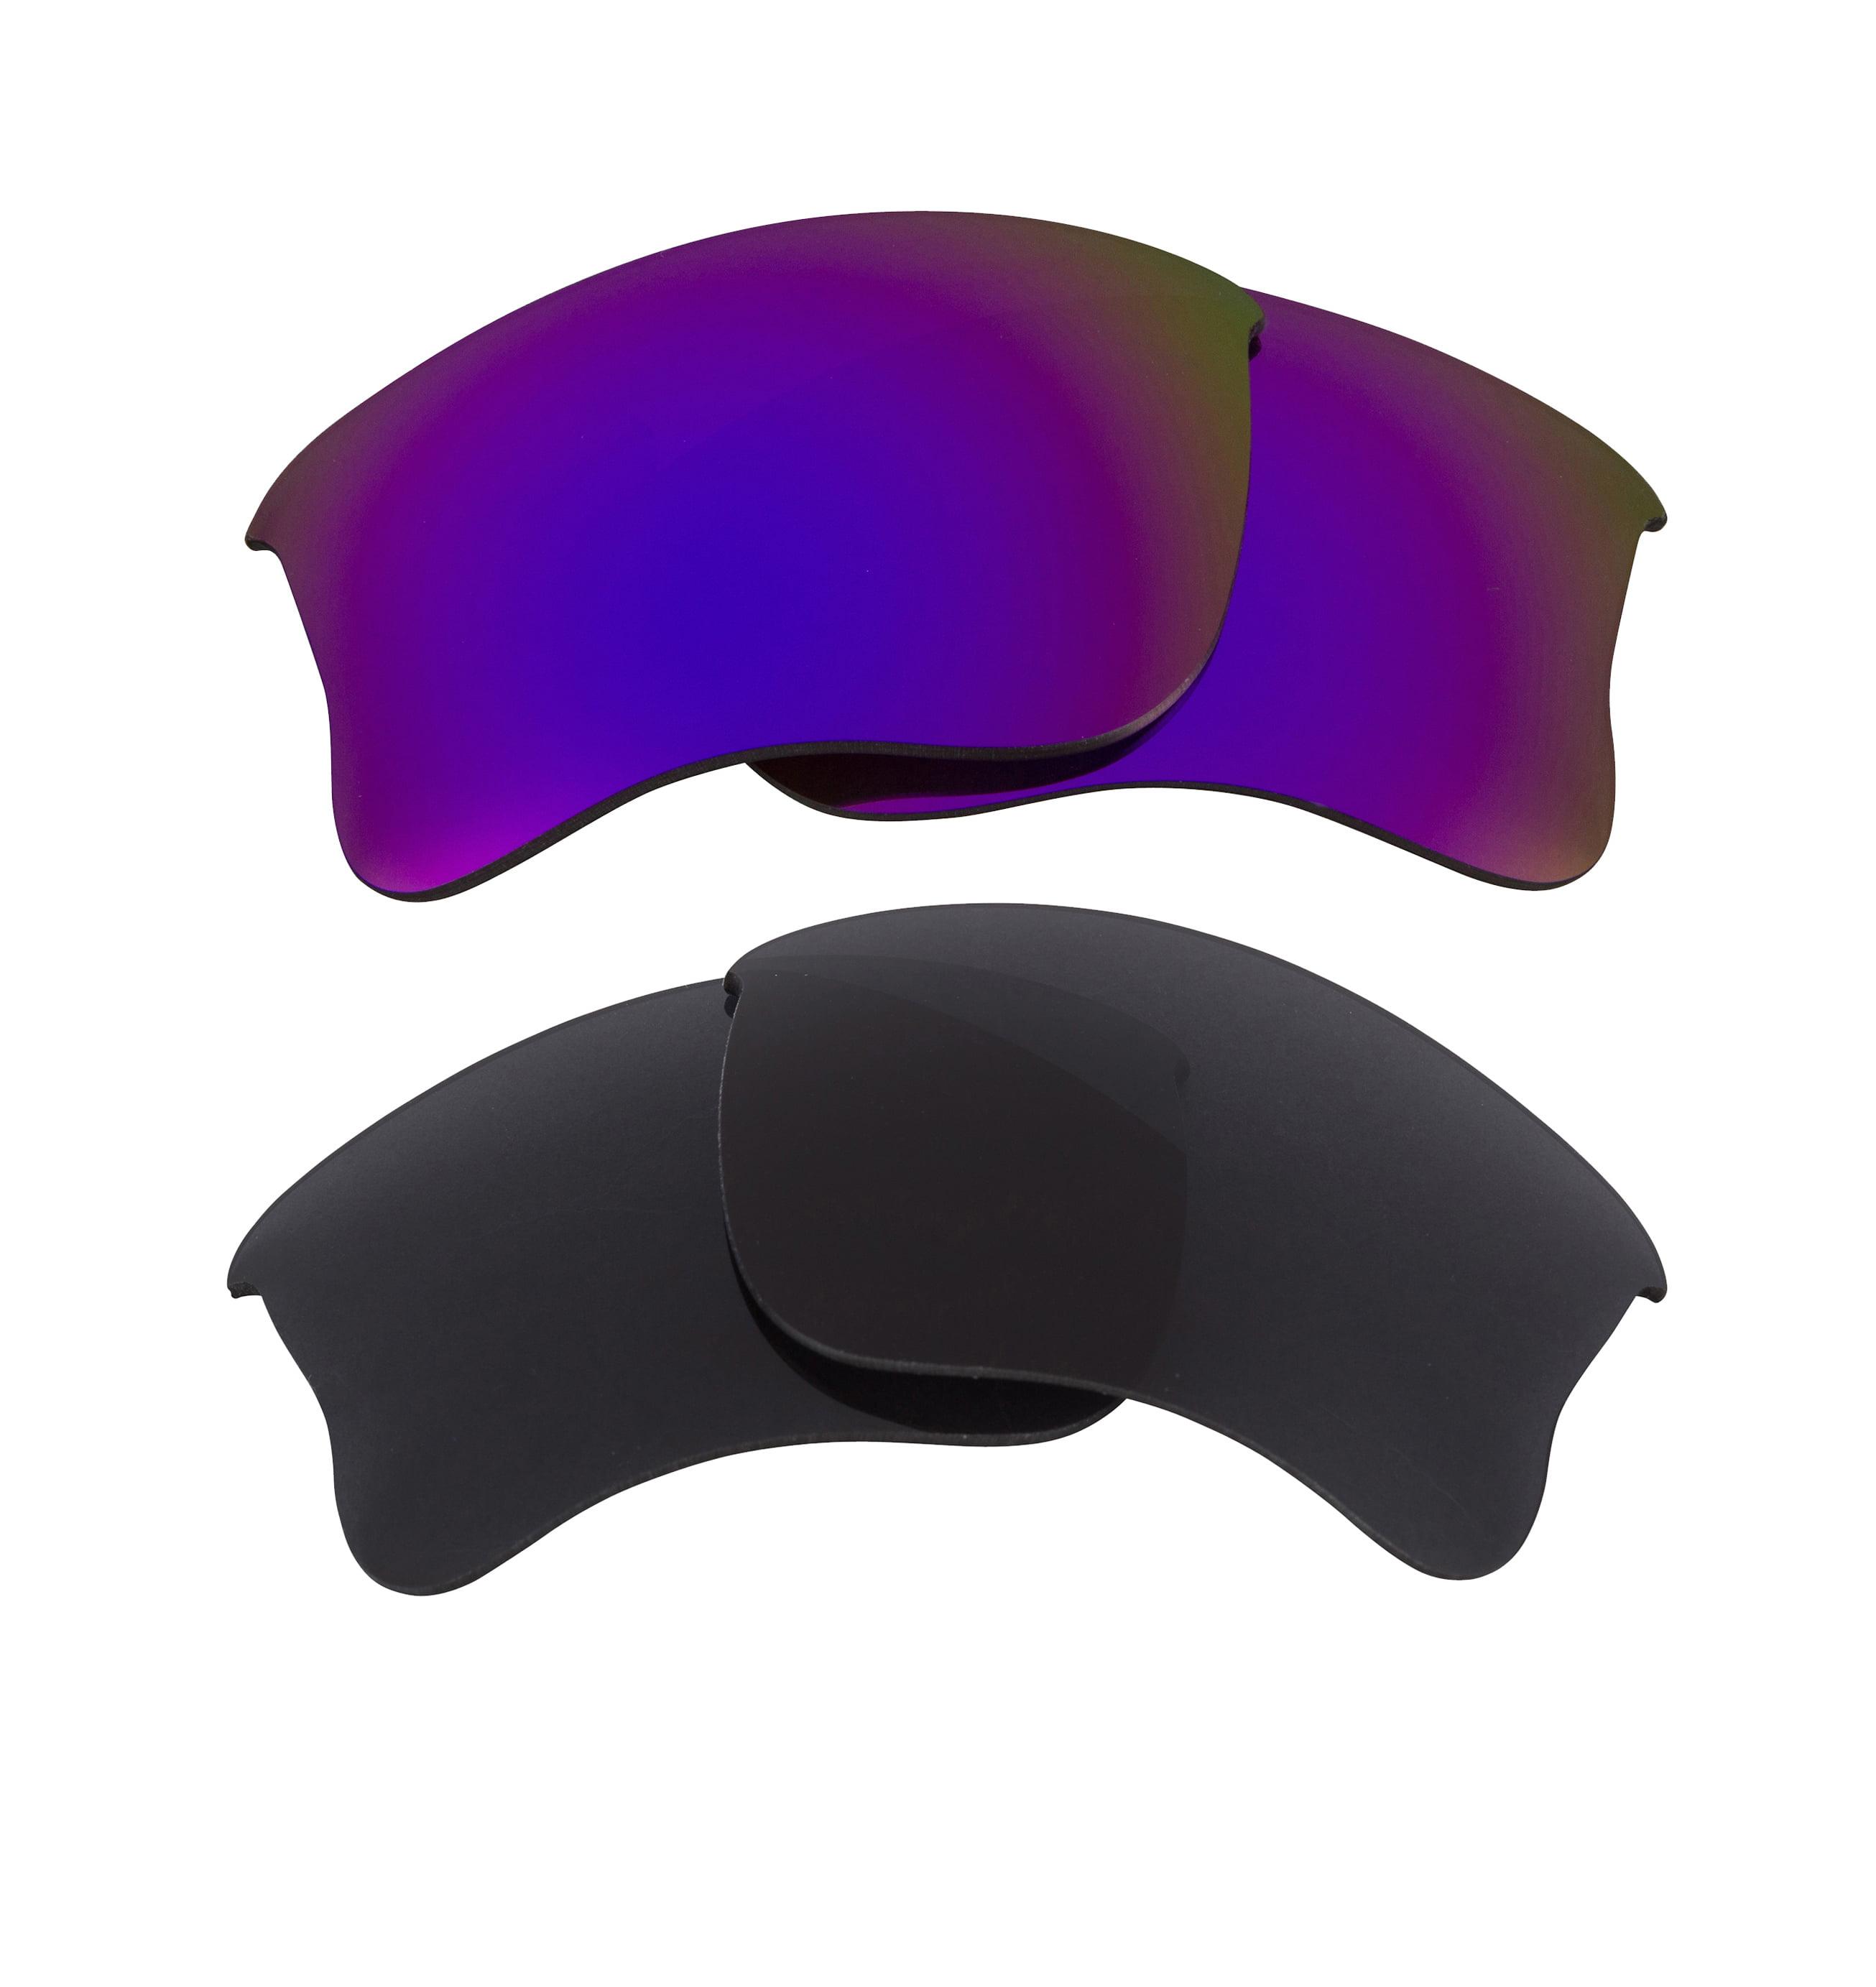 Half Jacket 2.0 XL Replacement Lenses Polarized Grey Purple by SEEK fits OAKLEY